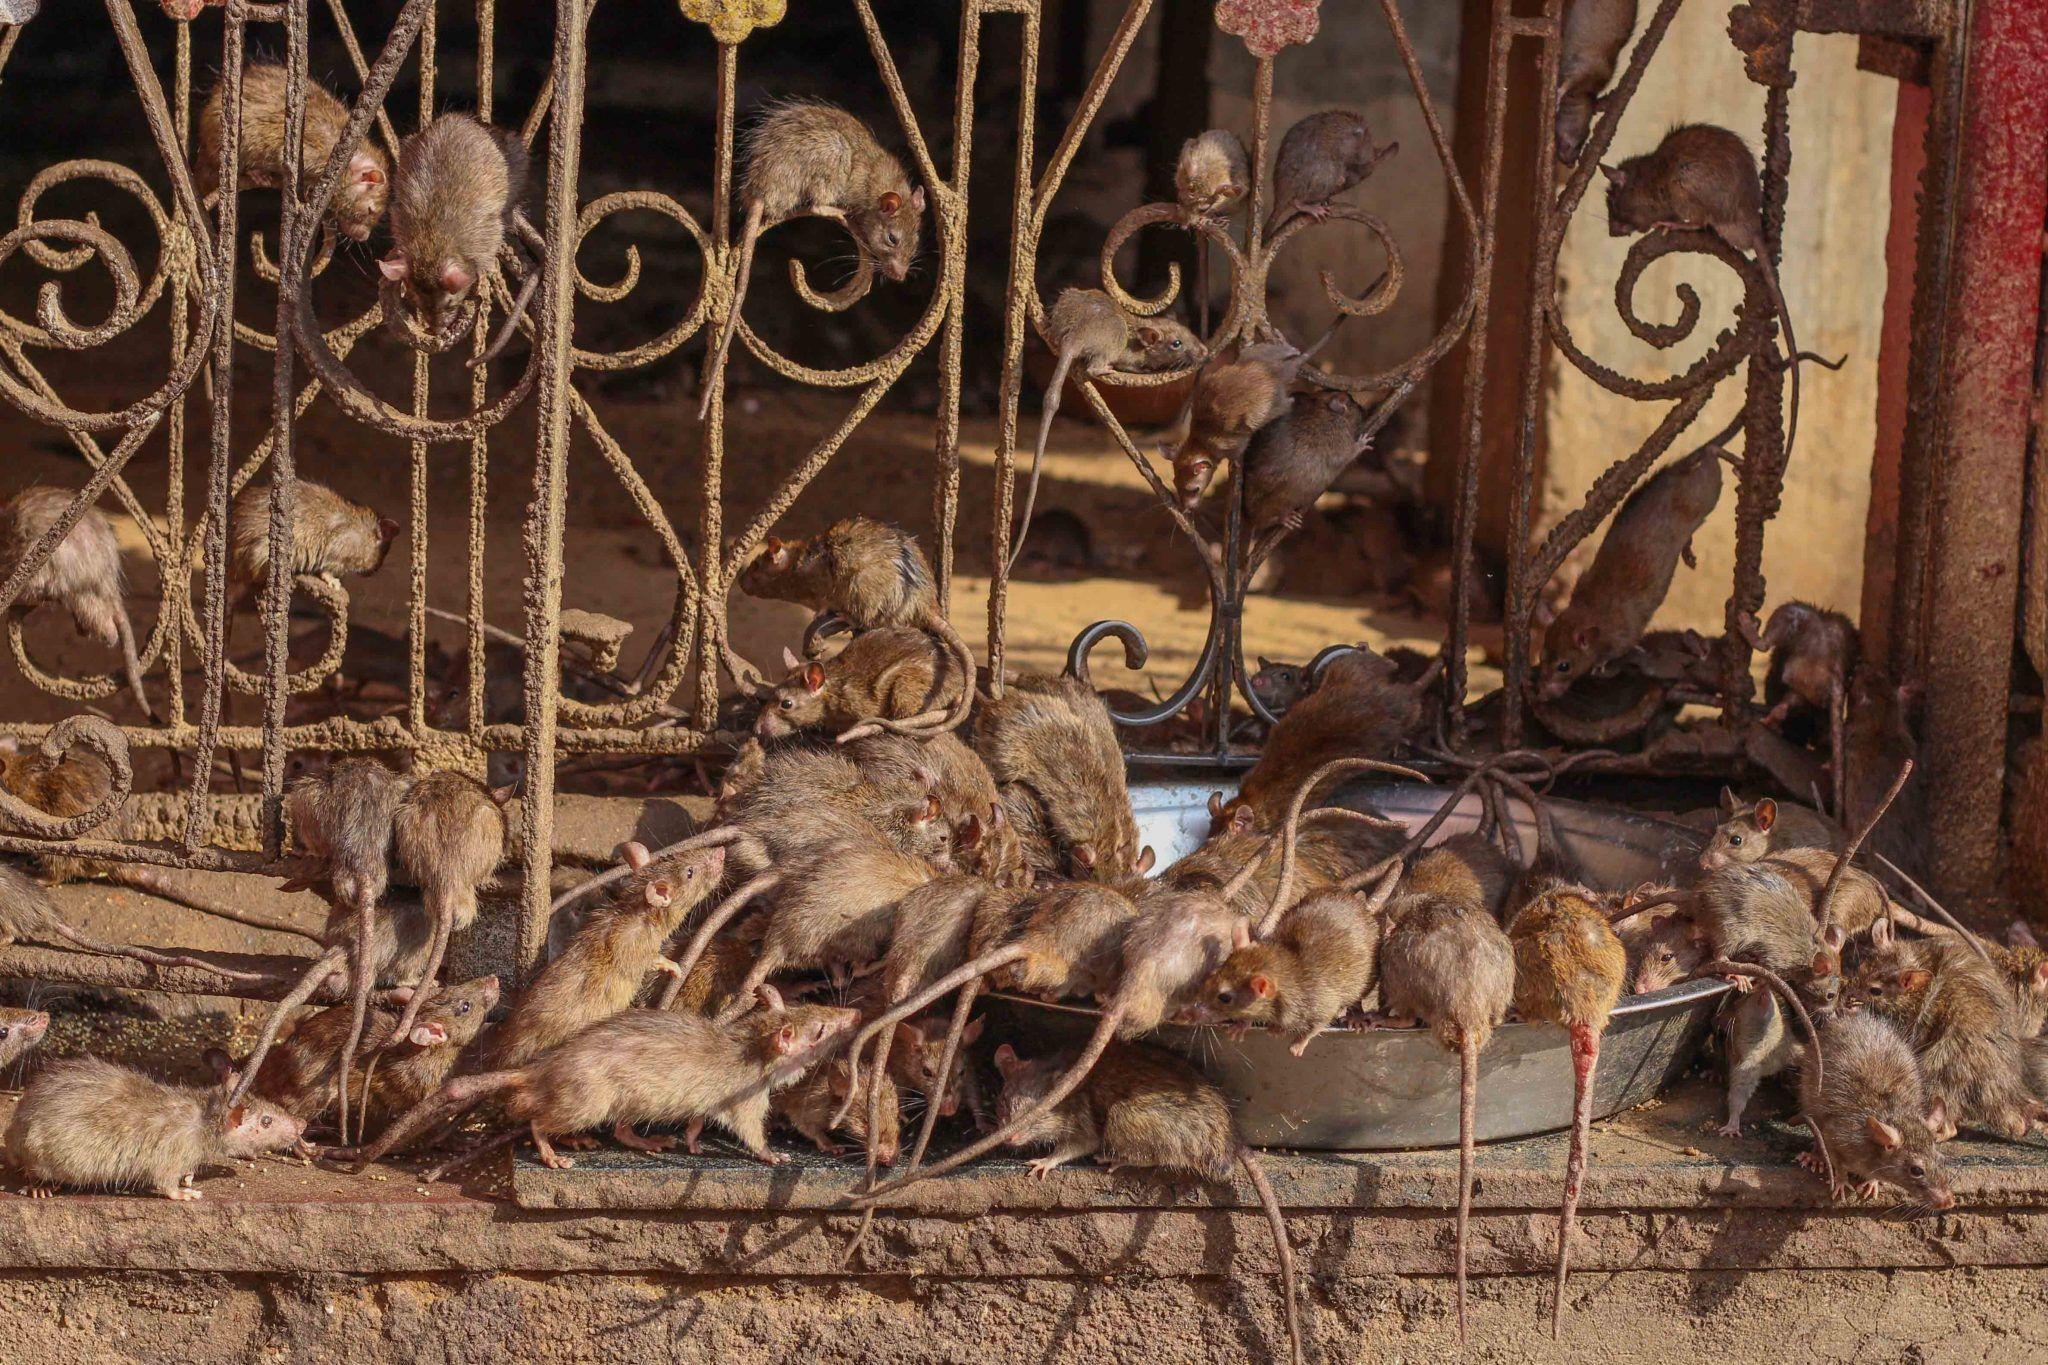 Rat temple of Rajasthan